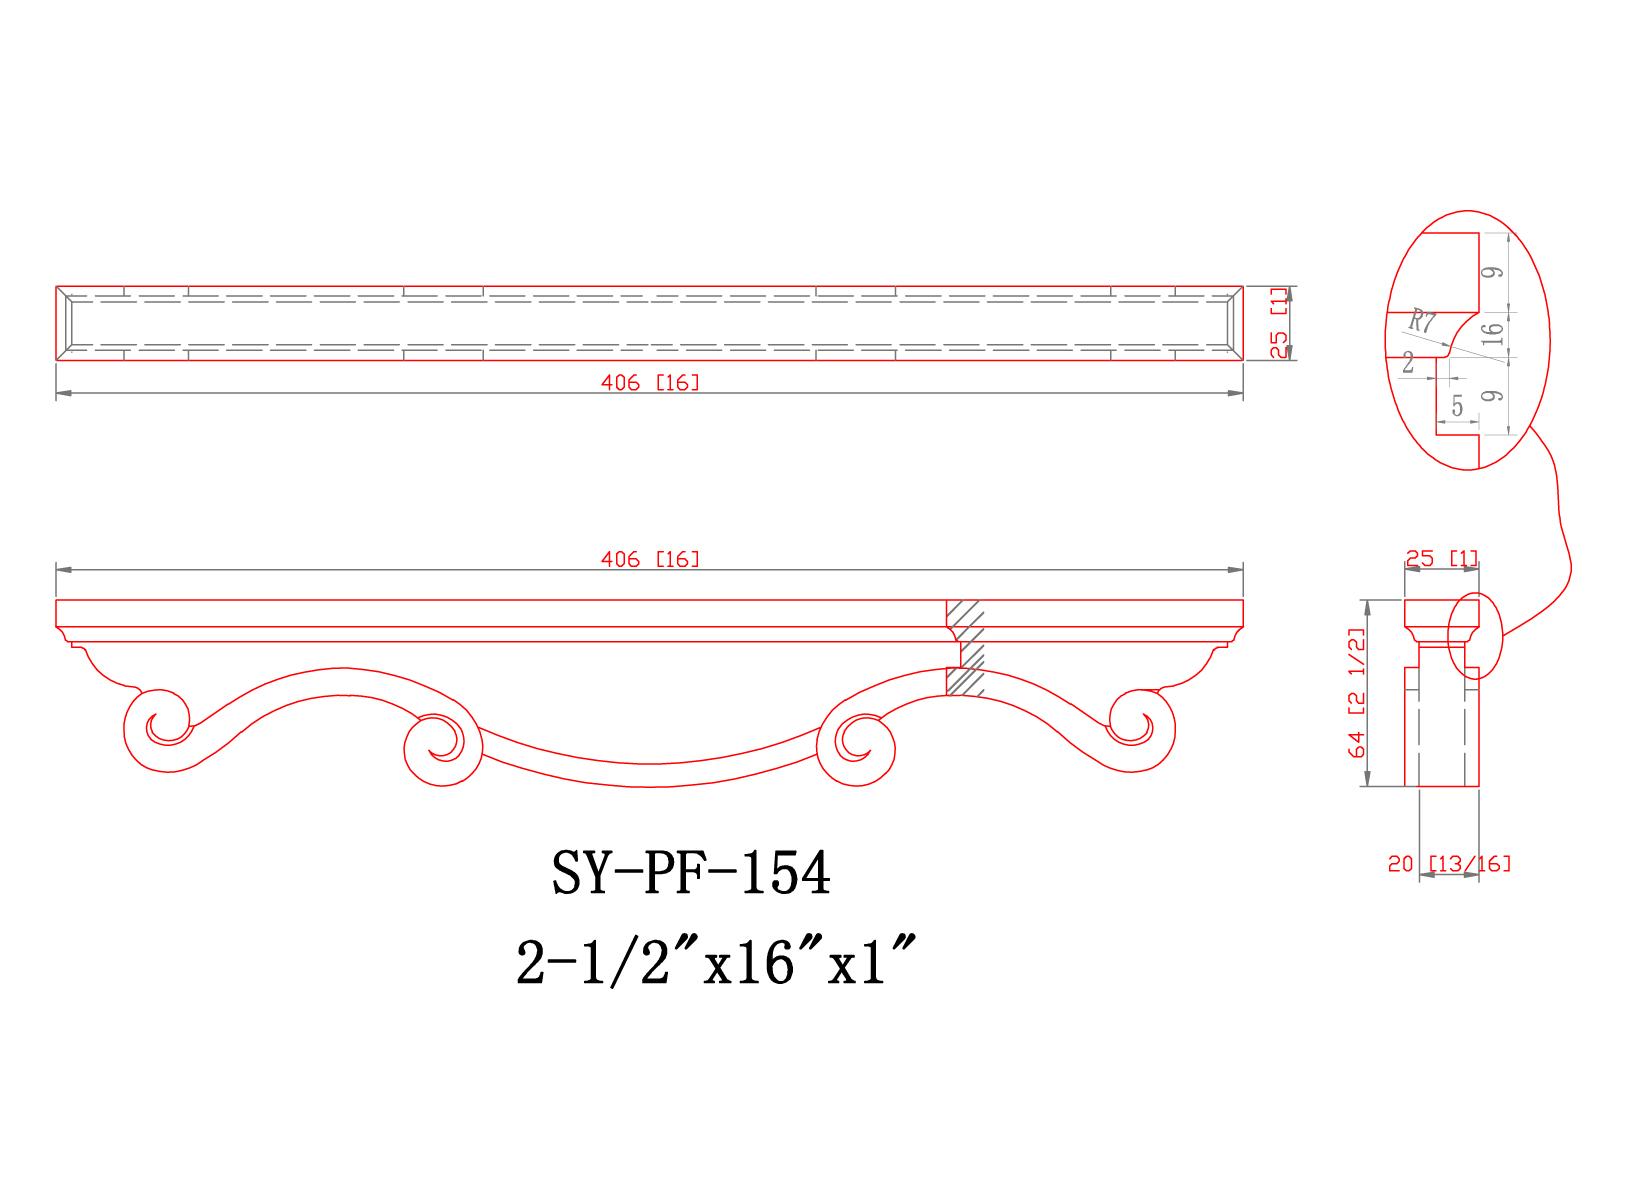 SY-PF-154 Linedrawing